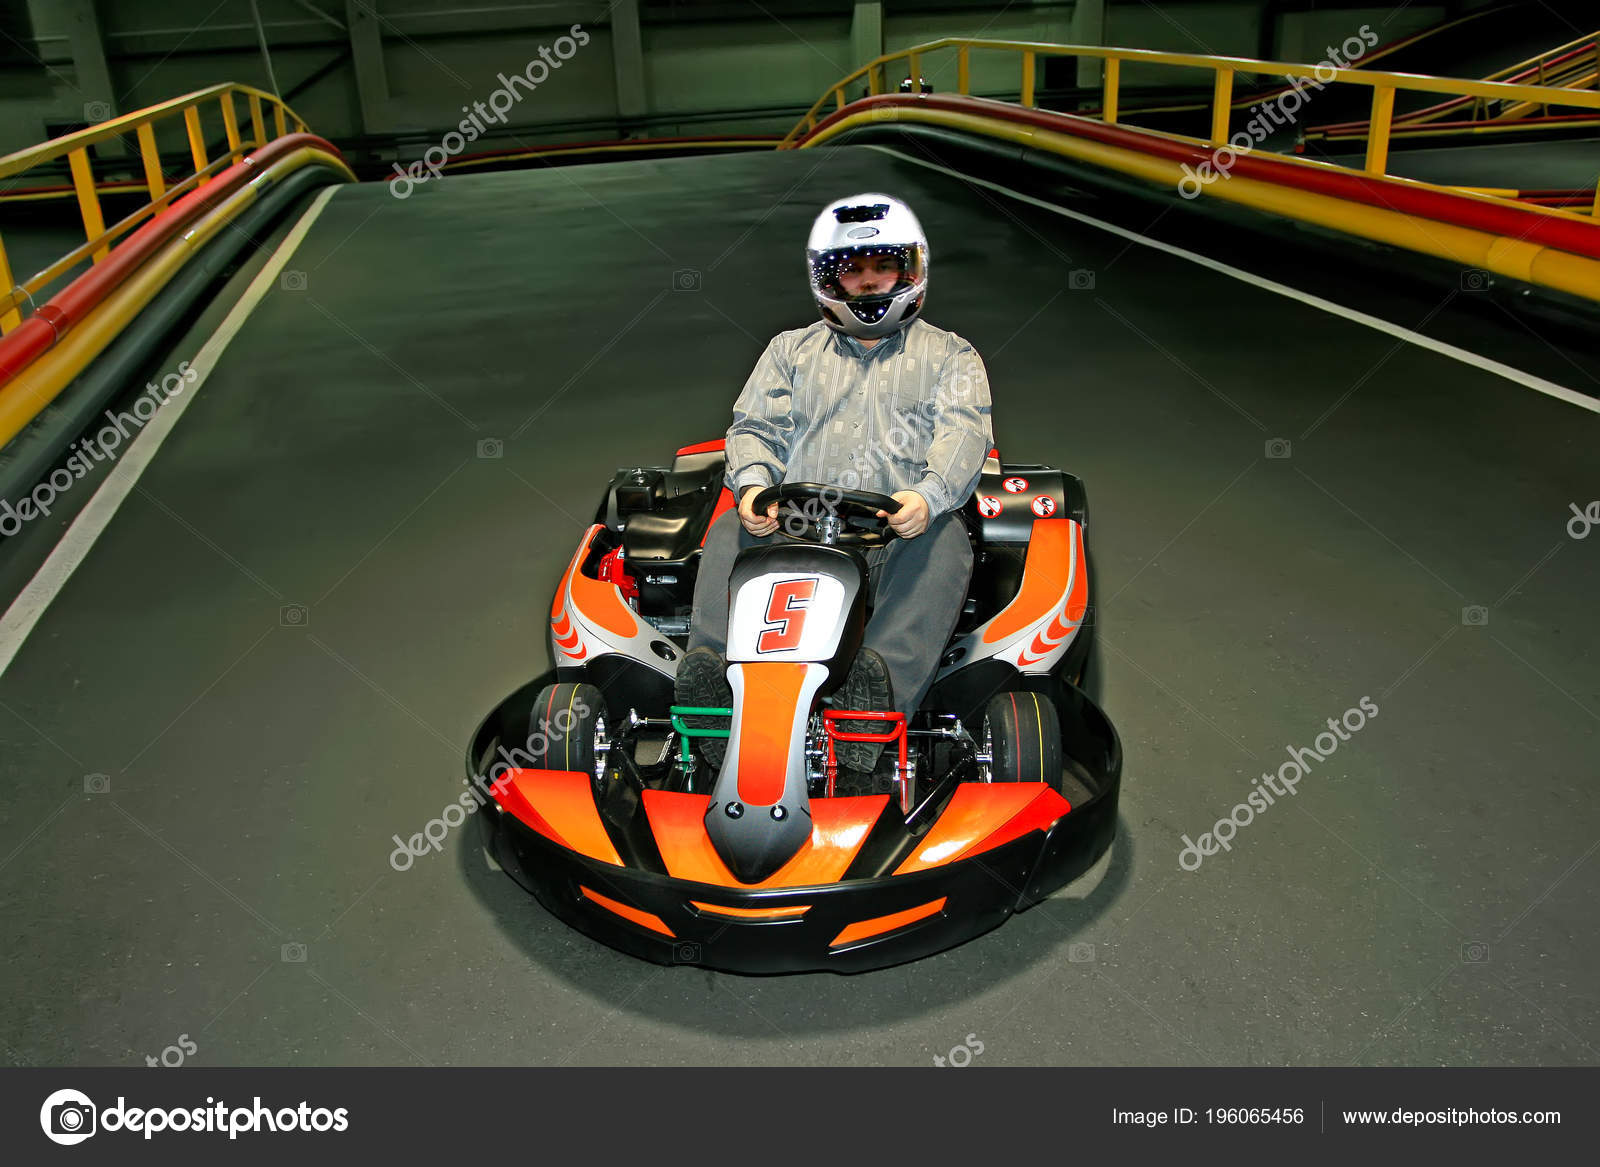 Circuito Karting : Hombre casco circuito karts pista karting interior u2014 fotos de stock